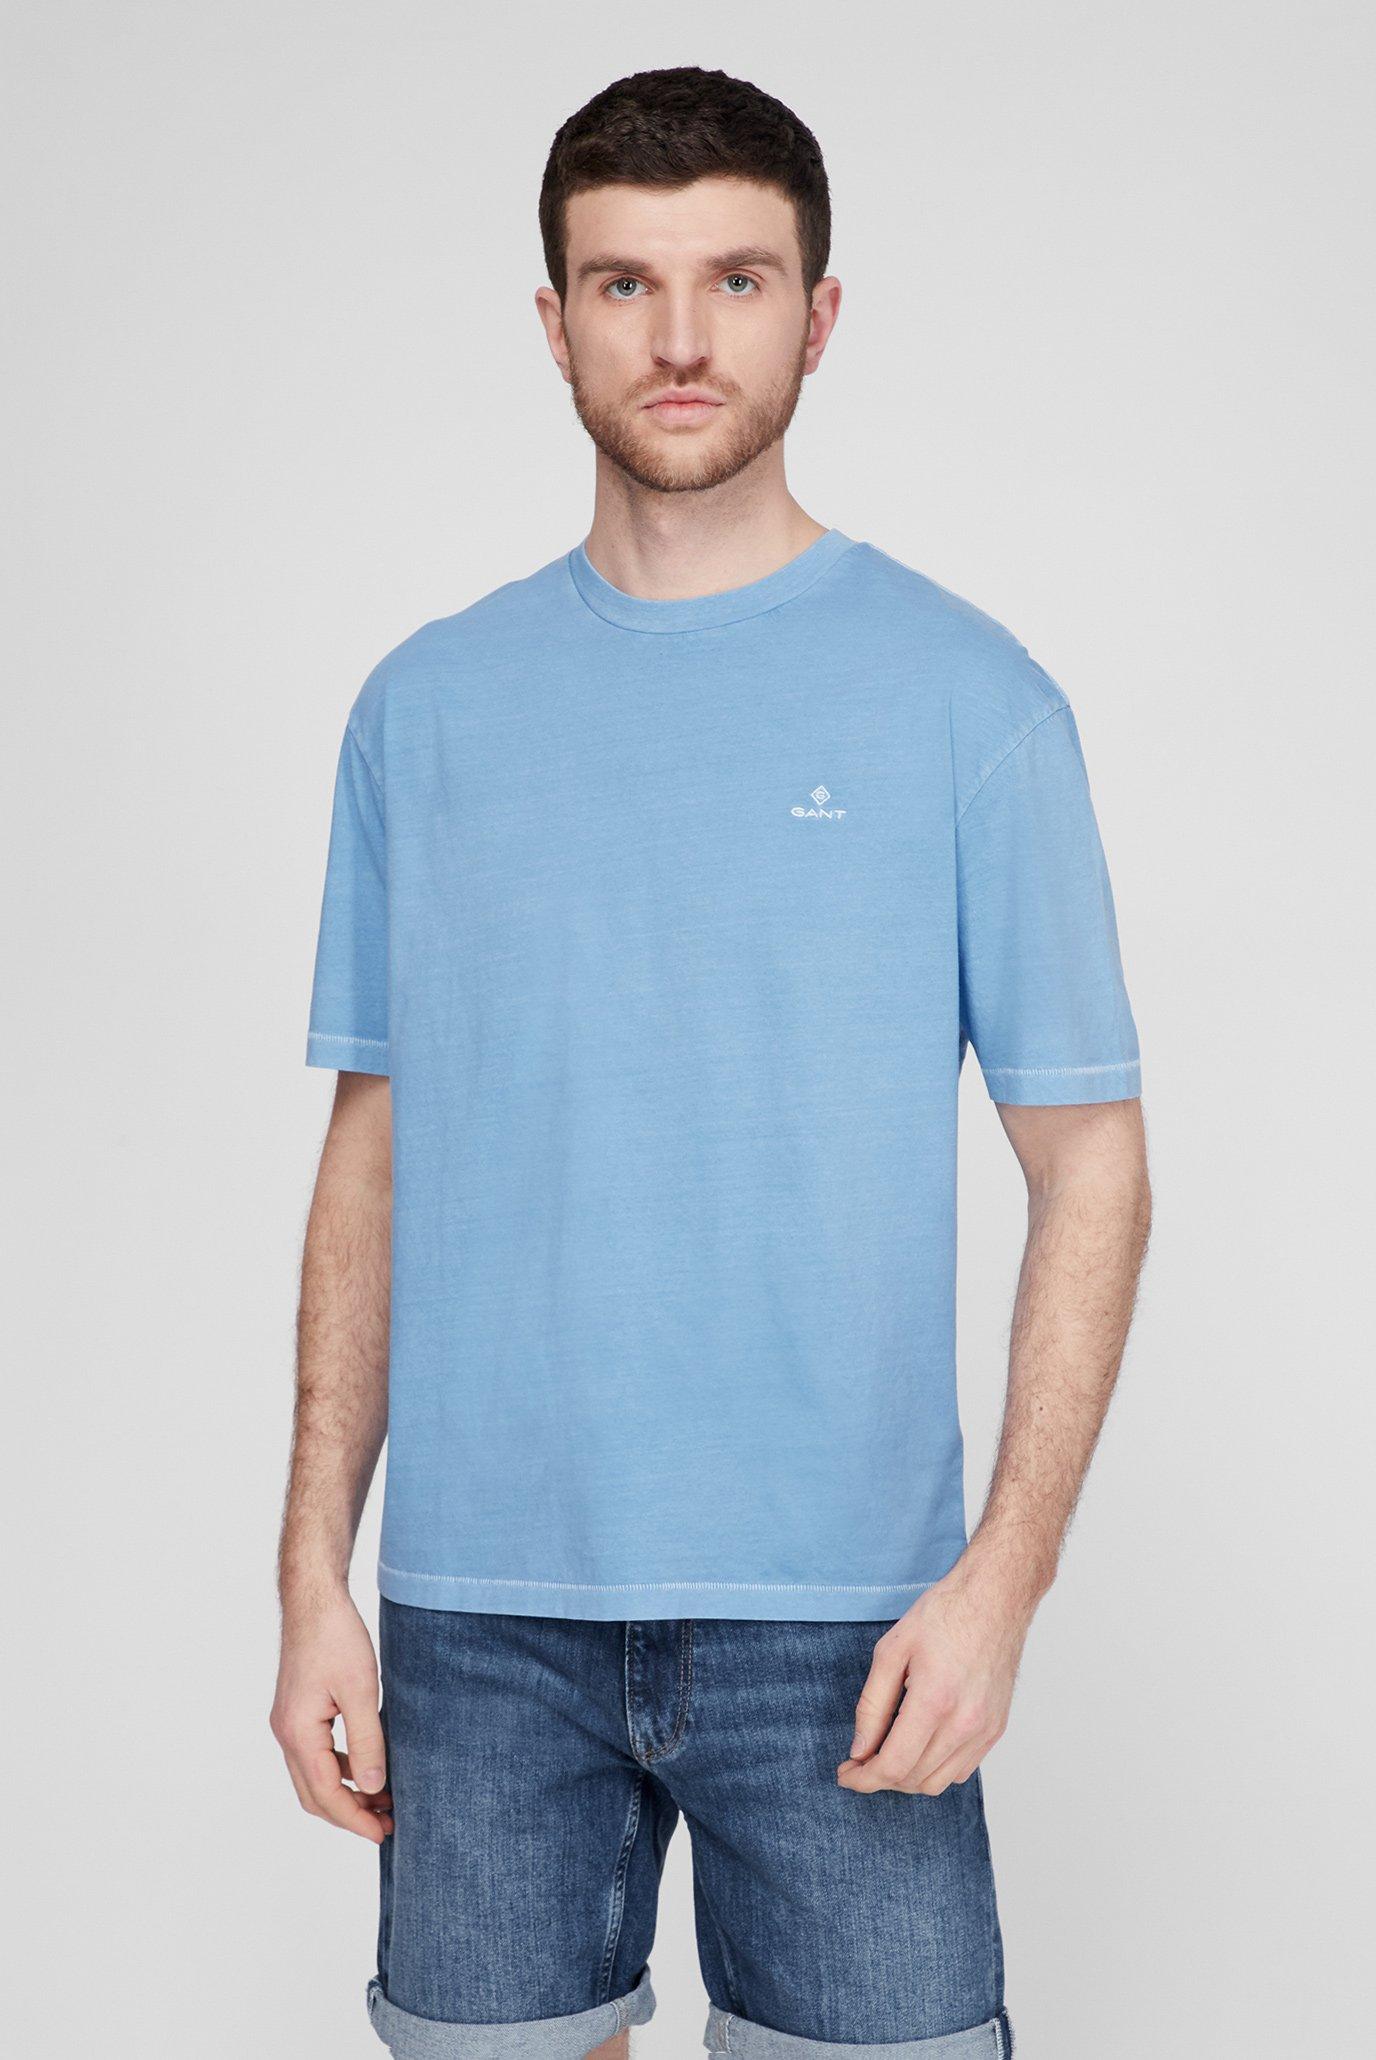 Мужская голубая футболка SUNFADED 1